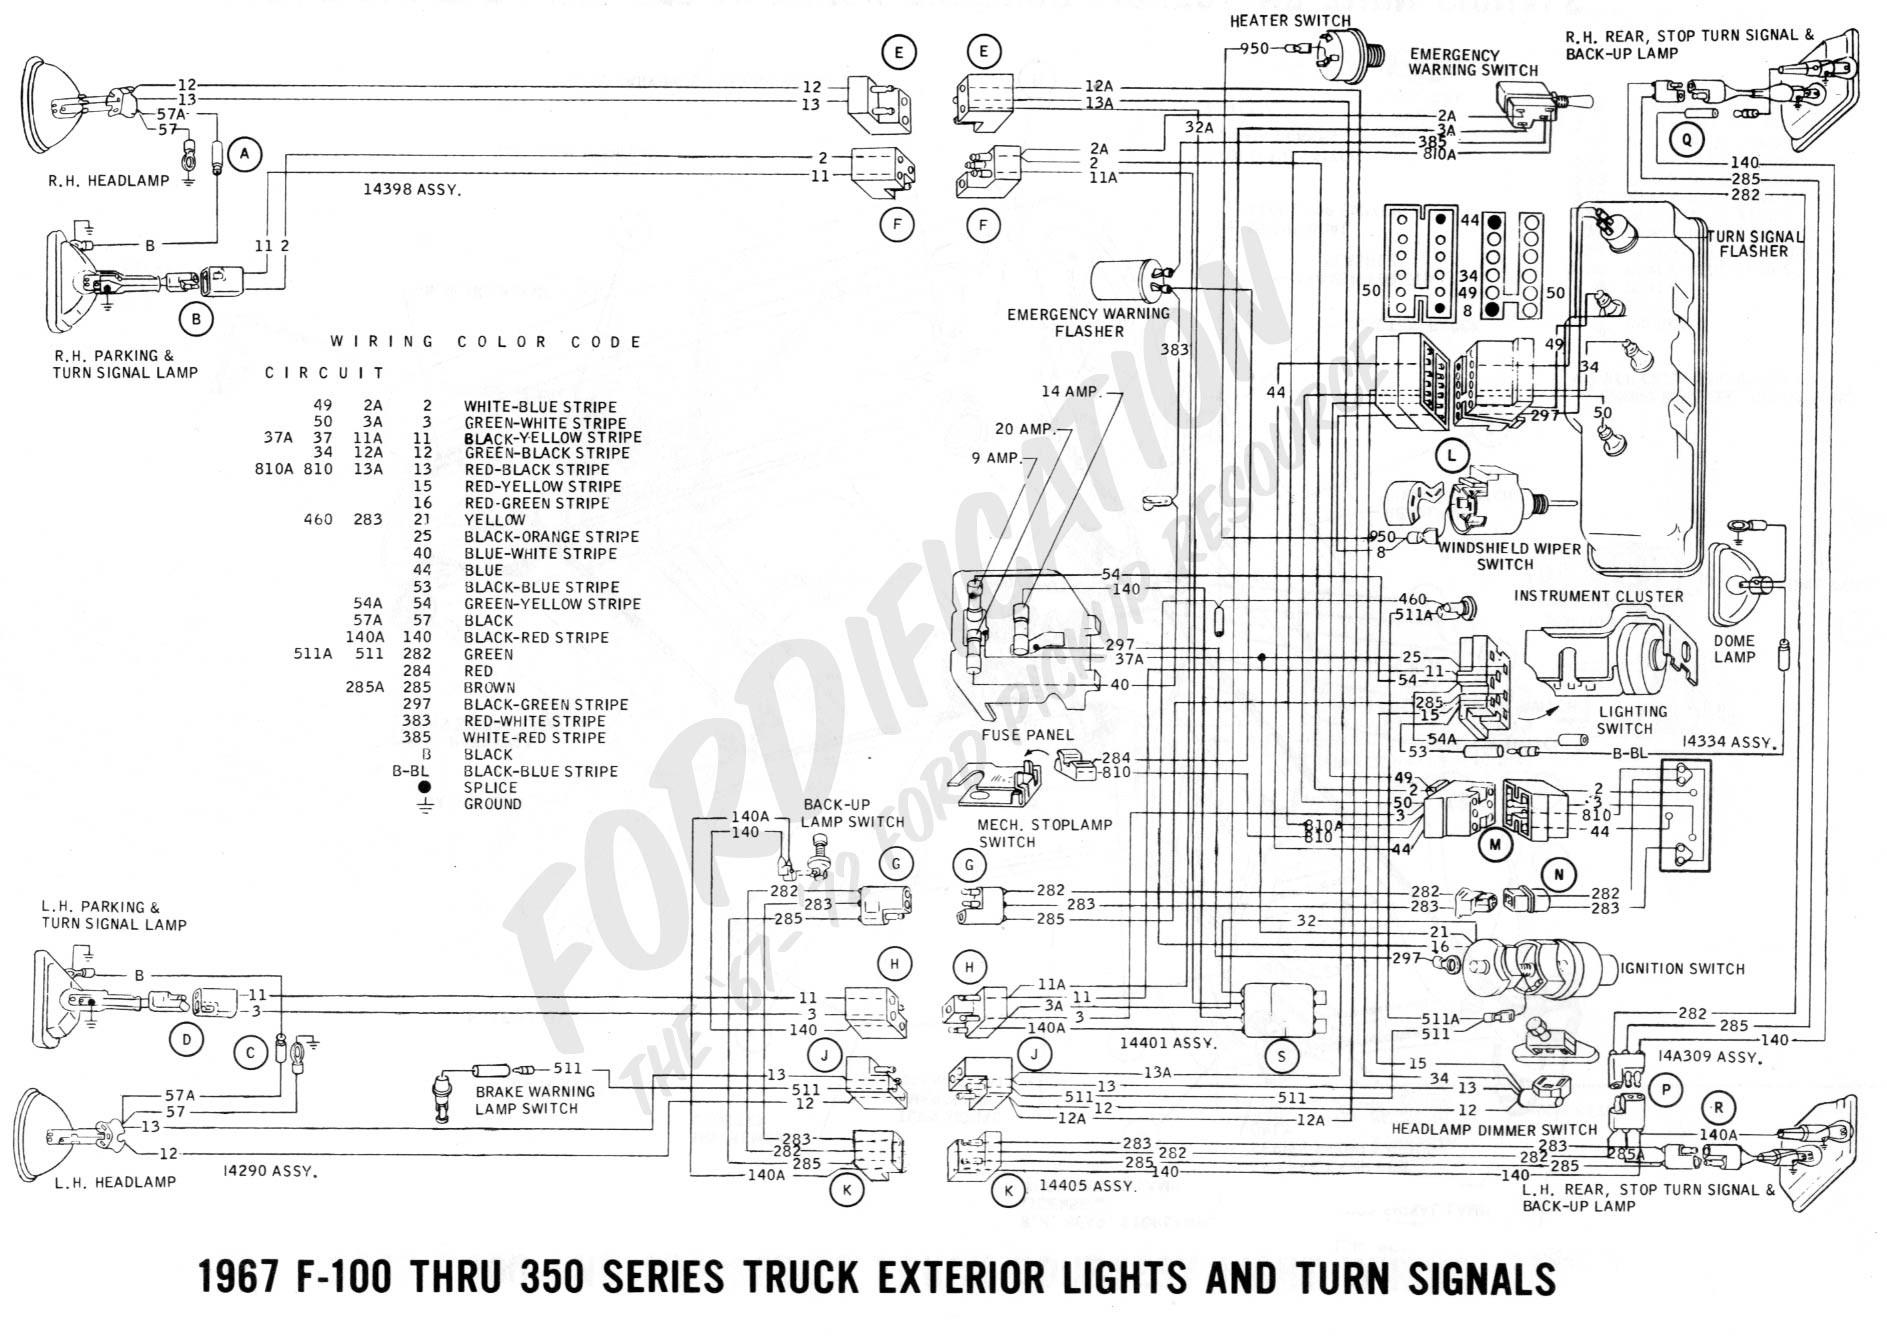 2004 ford f 150 pcm location 1967 ford f100 wiring diagram 2002 rh  linxglobal co